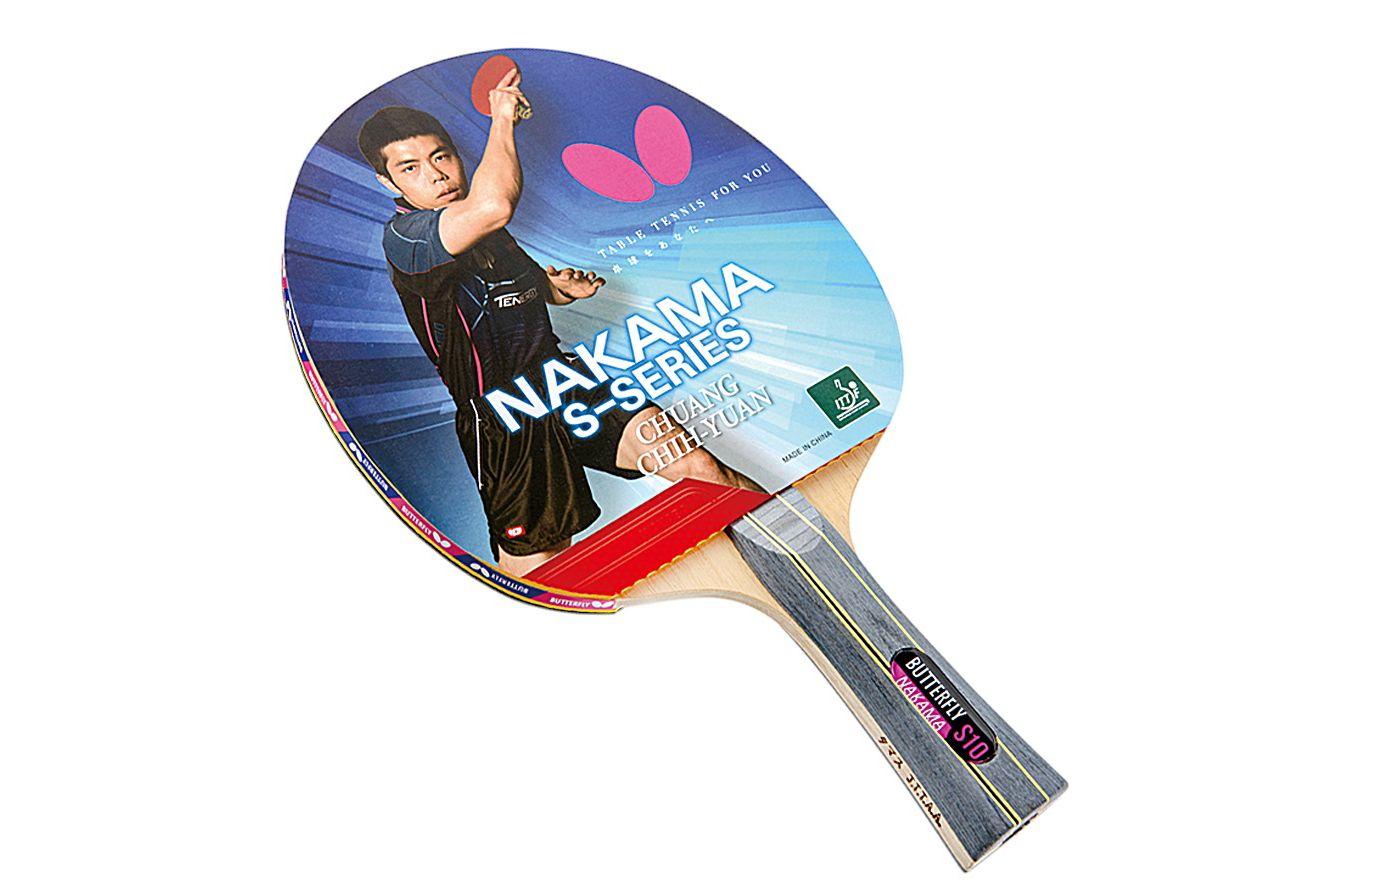 Butterfly Nakama S-10 Table Tennis Racket